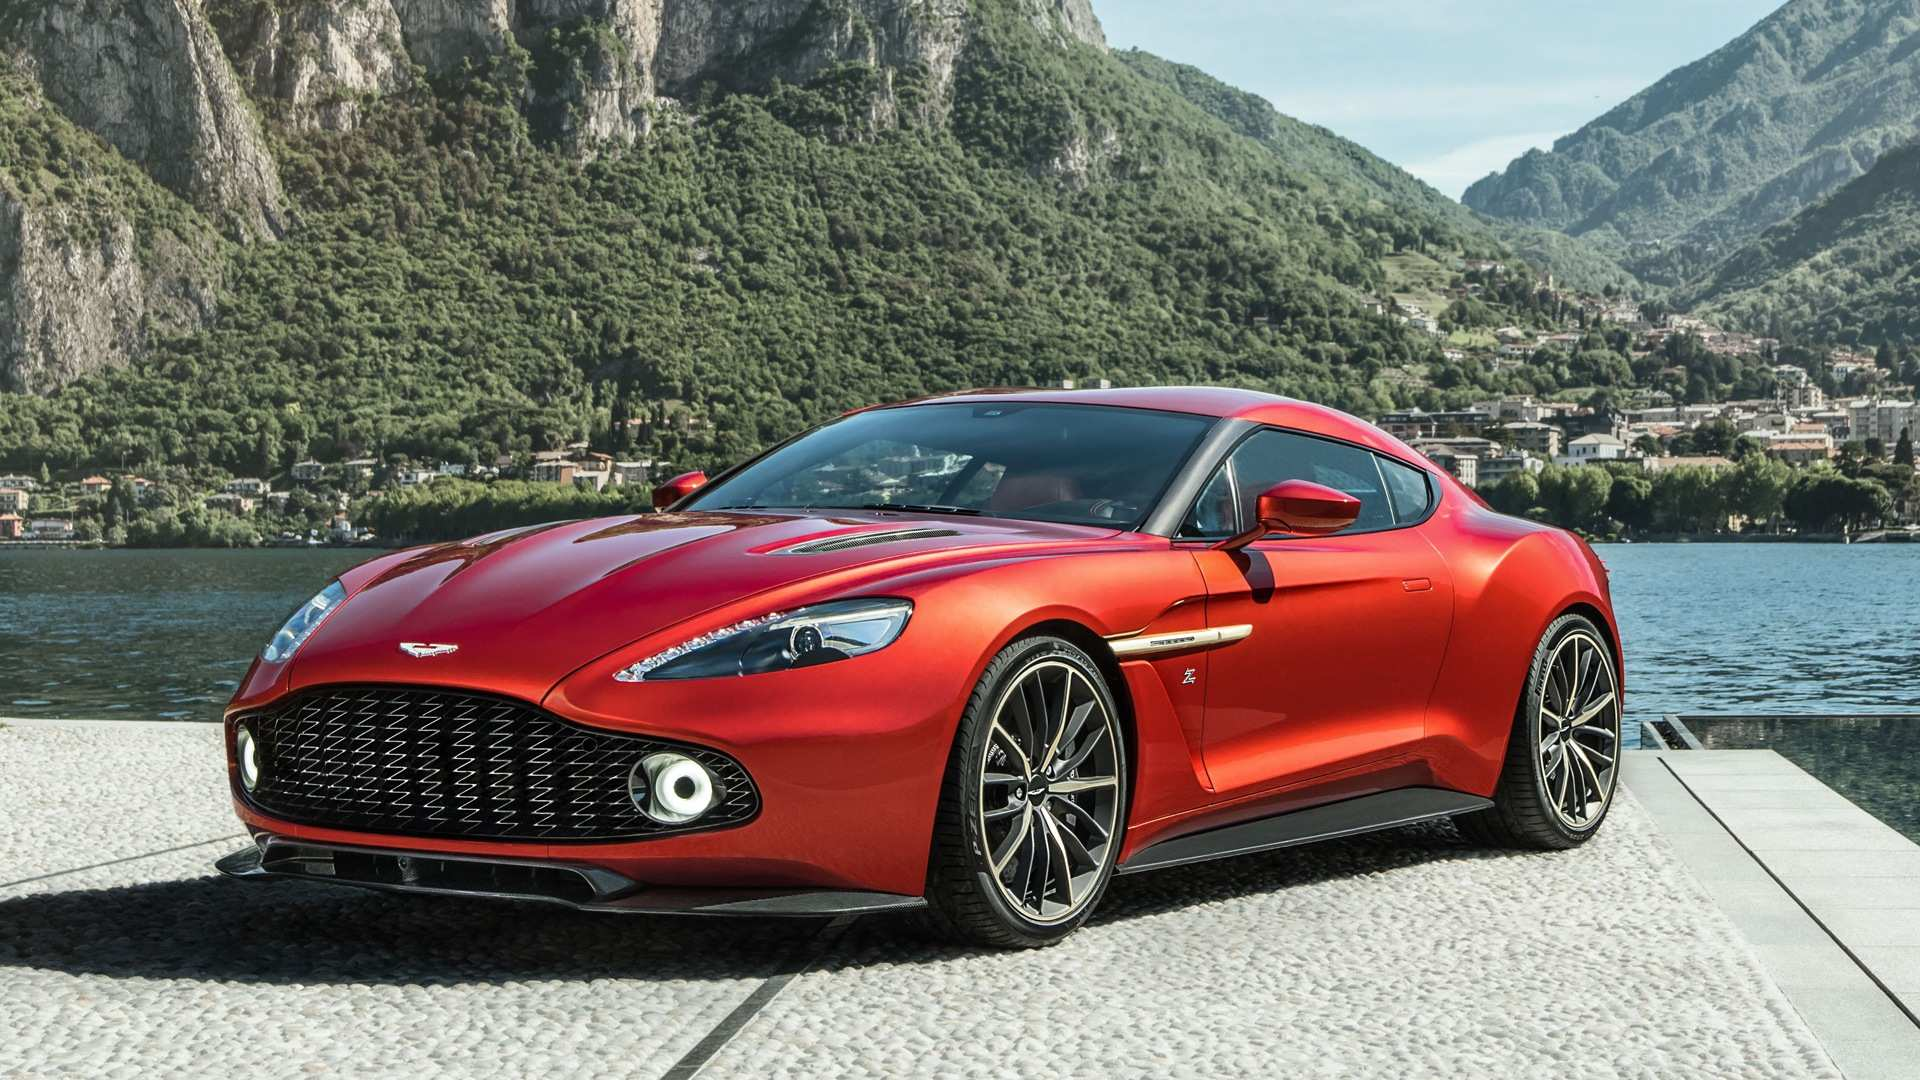 41 New 2019 Aston Martin Vanquish First Drive by 2019 Aston Martin Vanquish